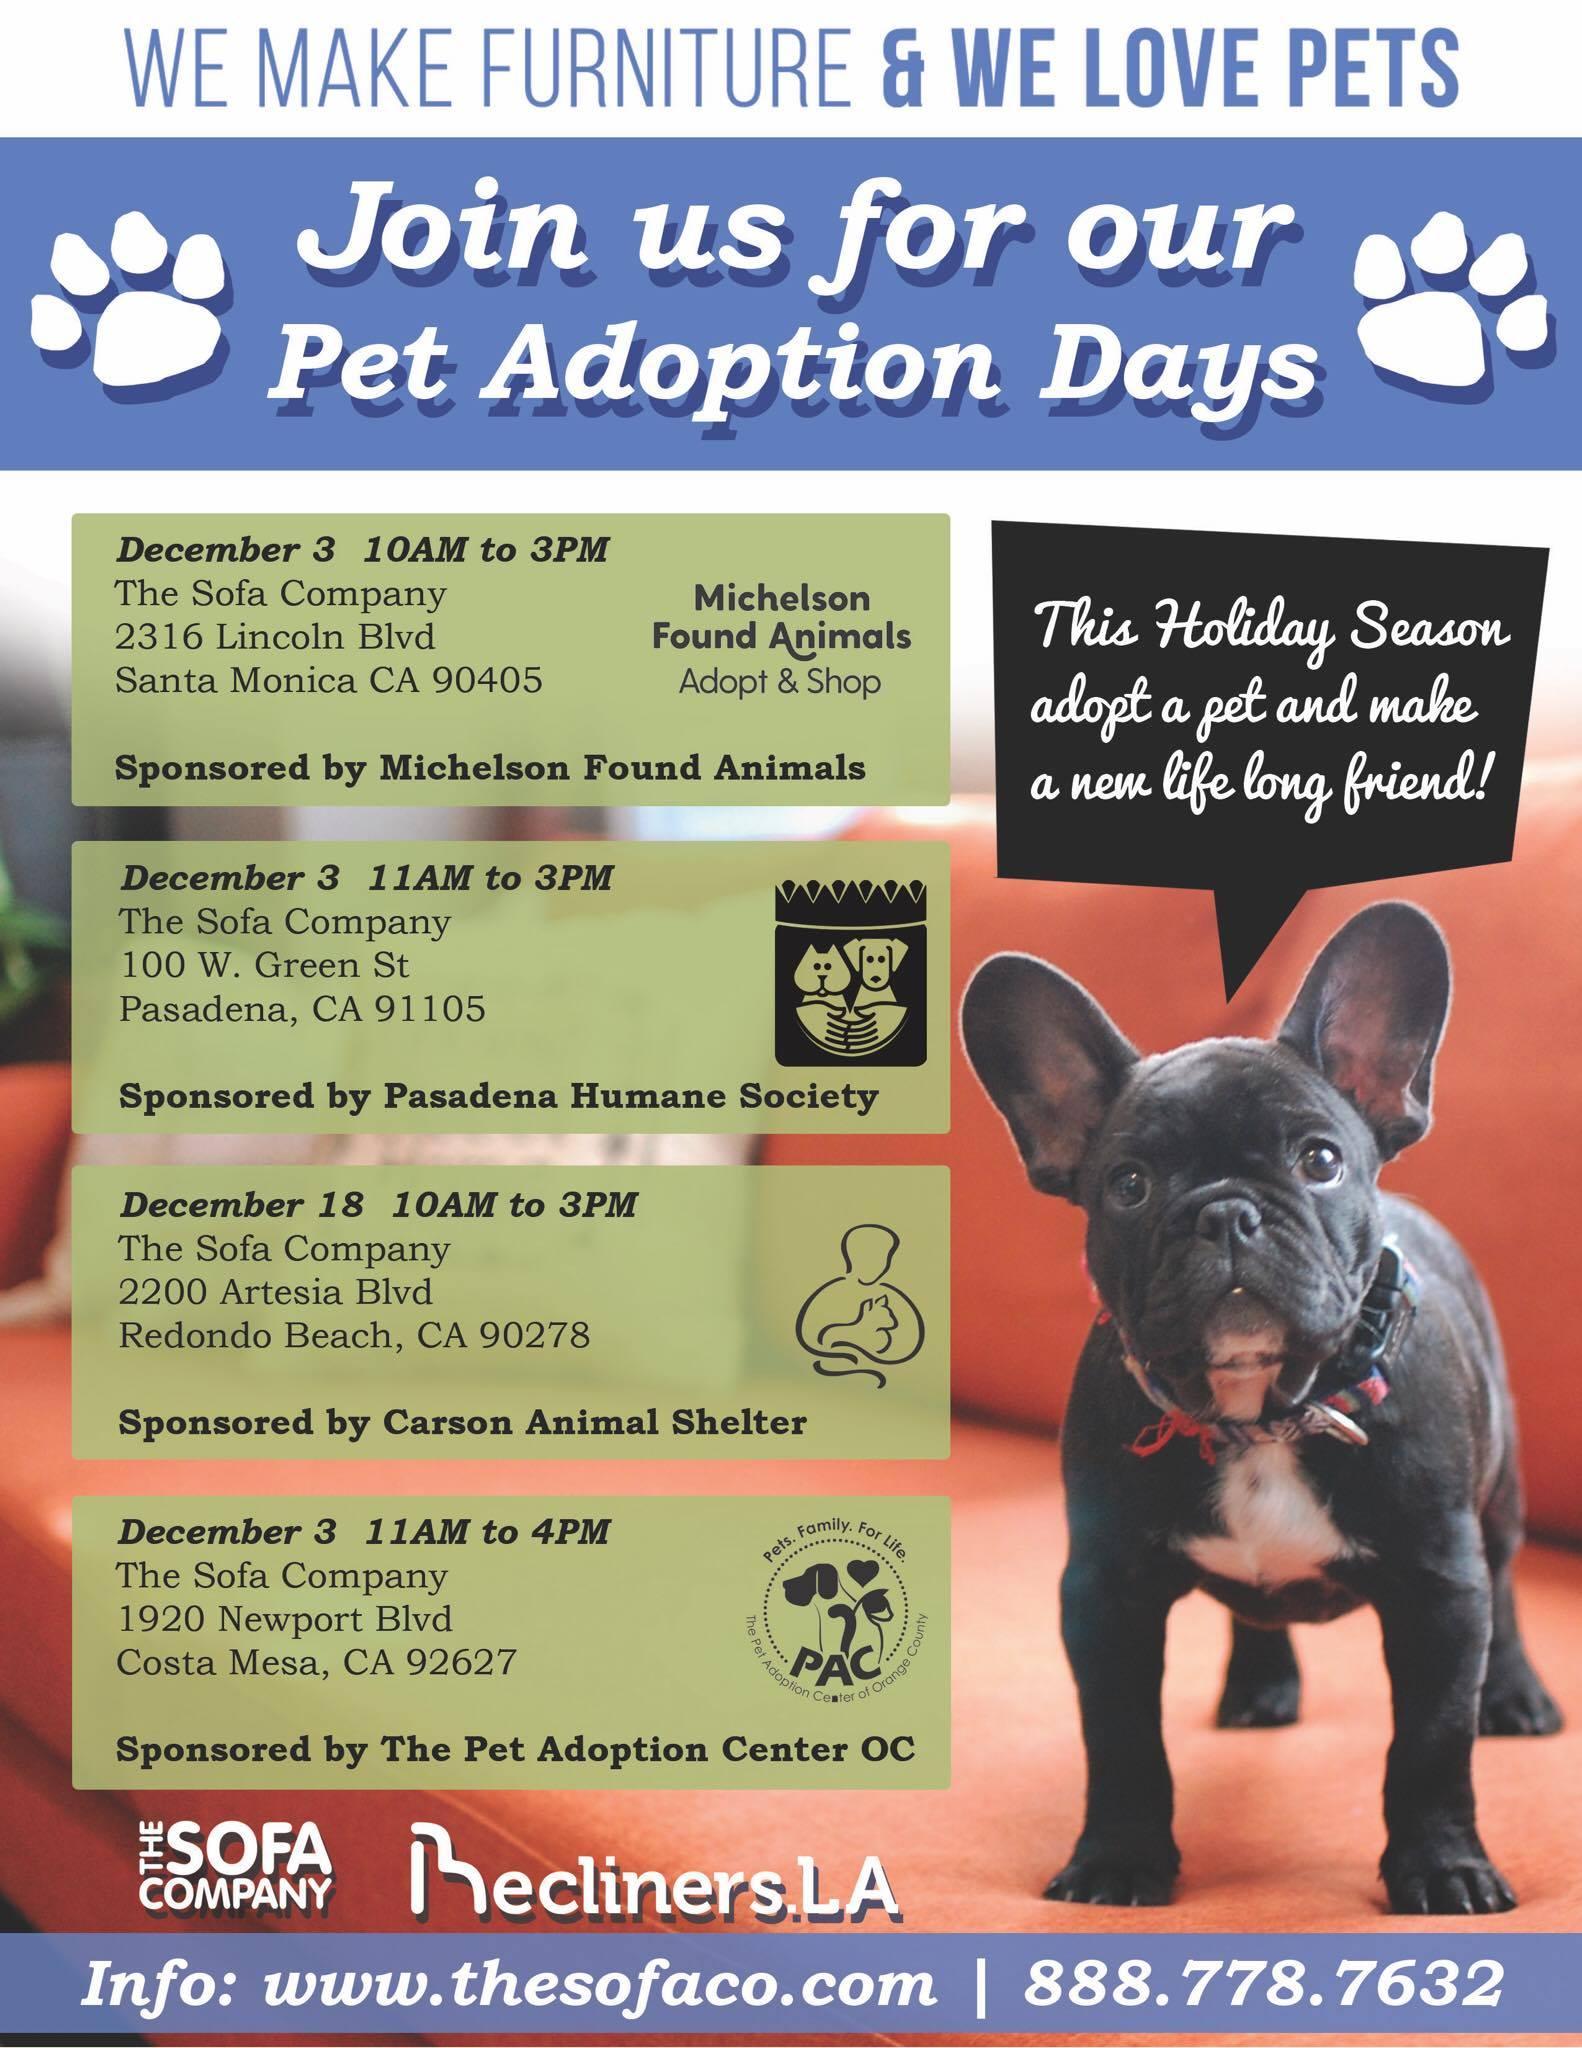 Sofa King Pet Adoption Days